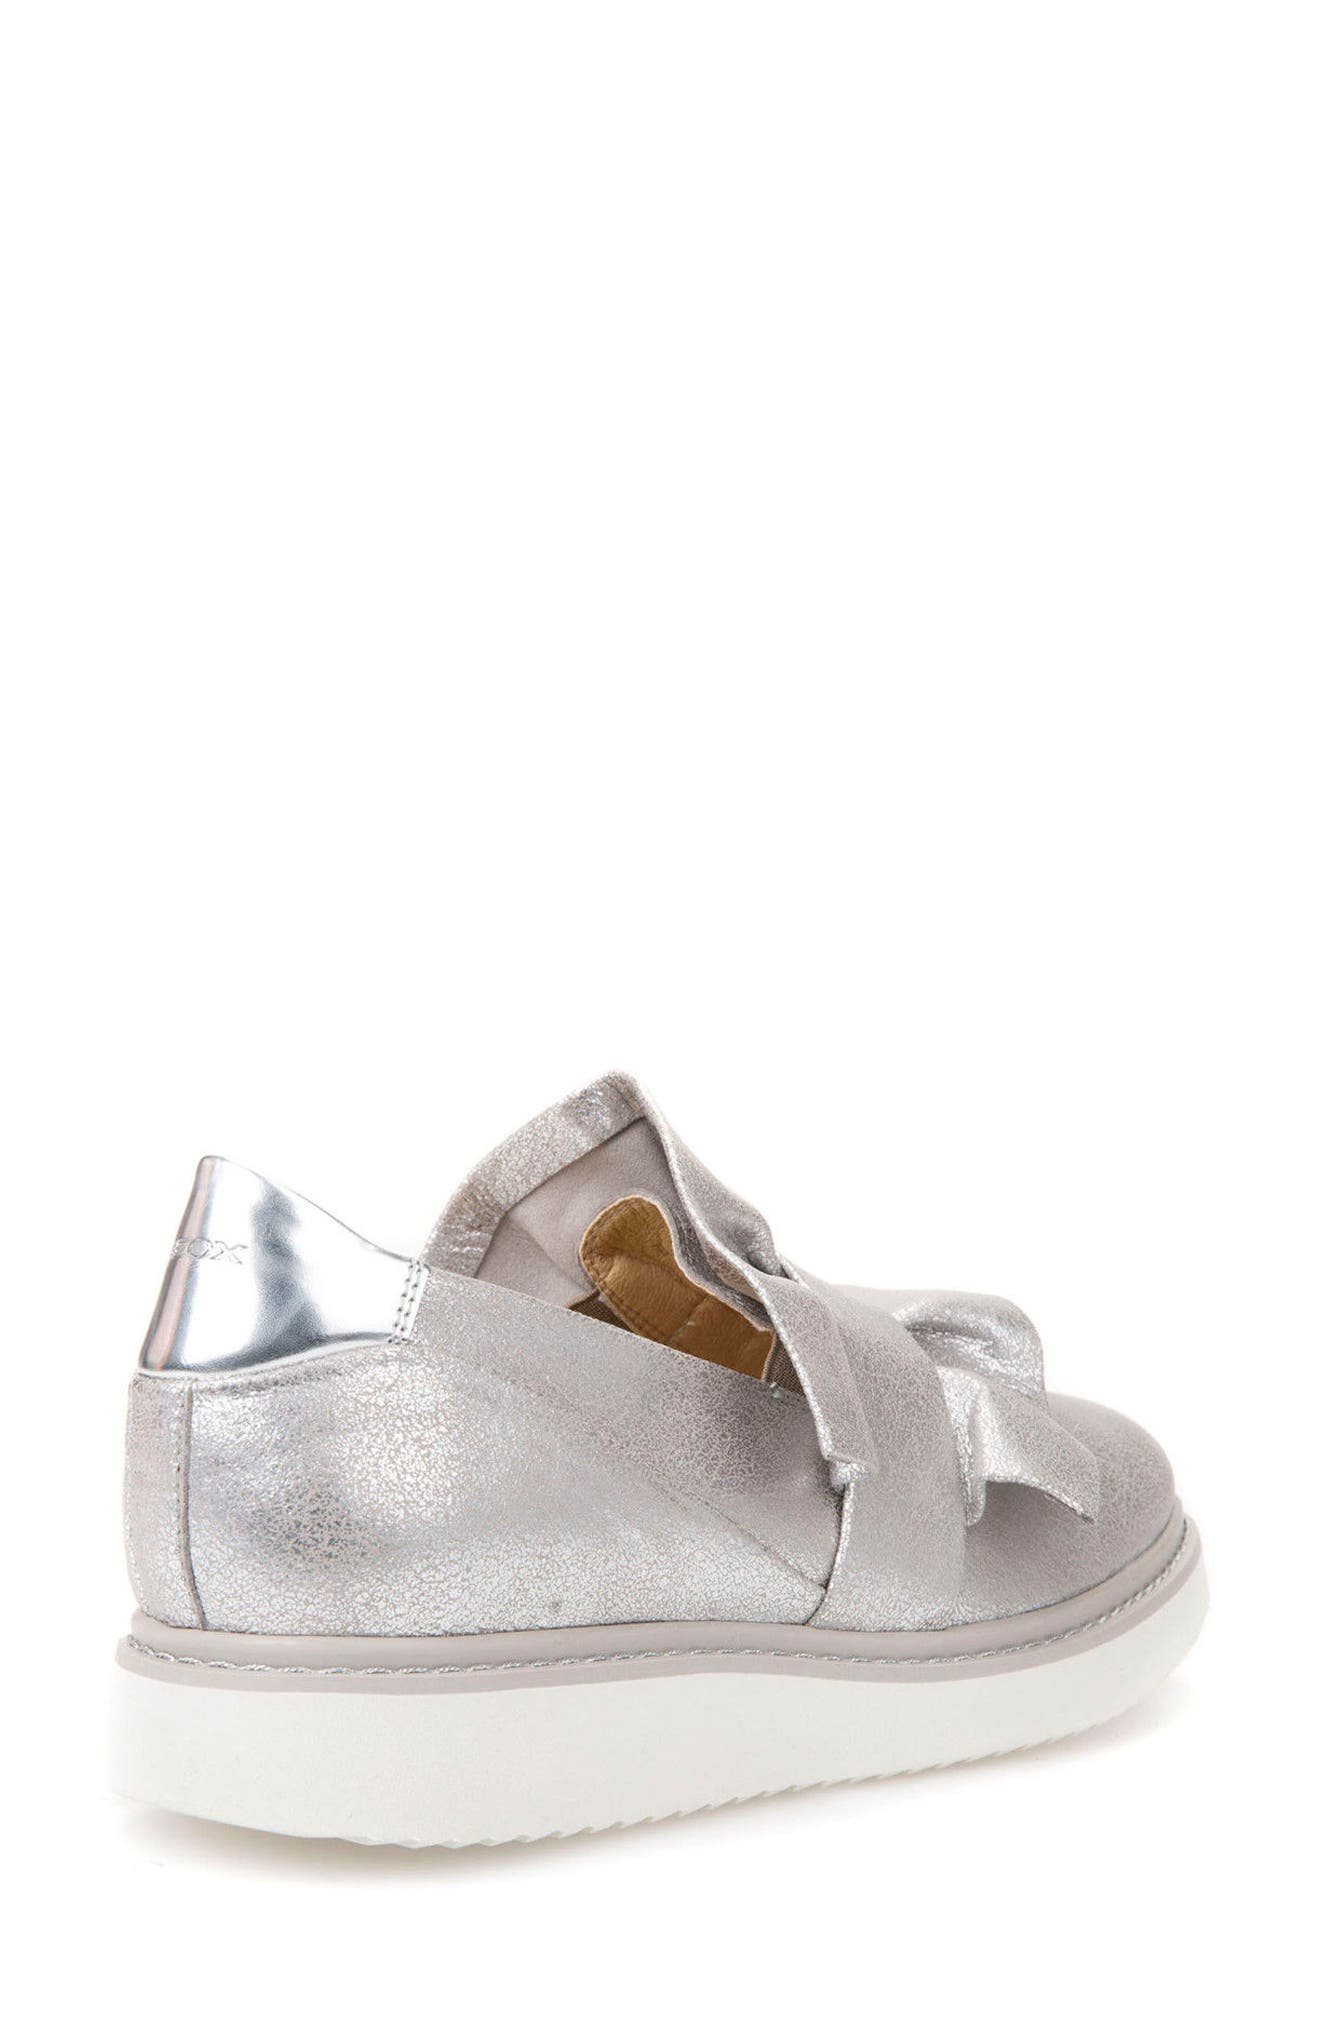 Thymar 15 Slip-On Sneaker,                             Alternate thumbnail 2, color,                             Silver Fabric